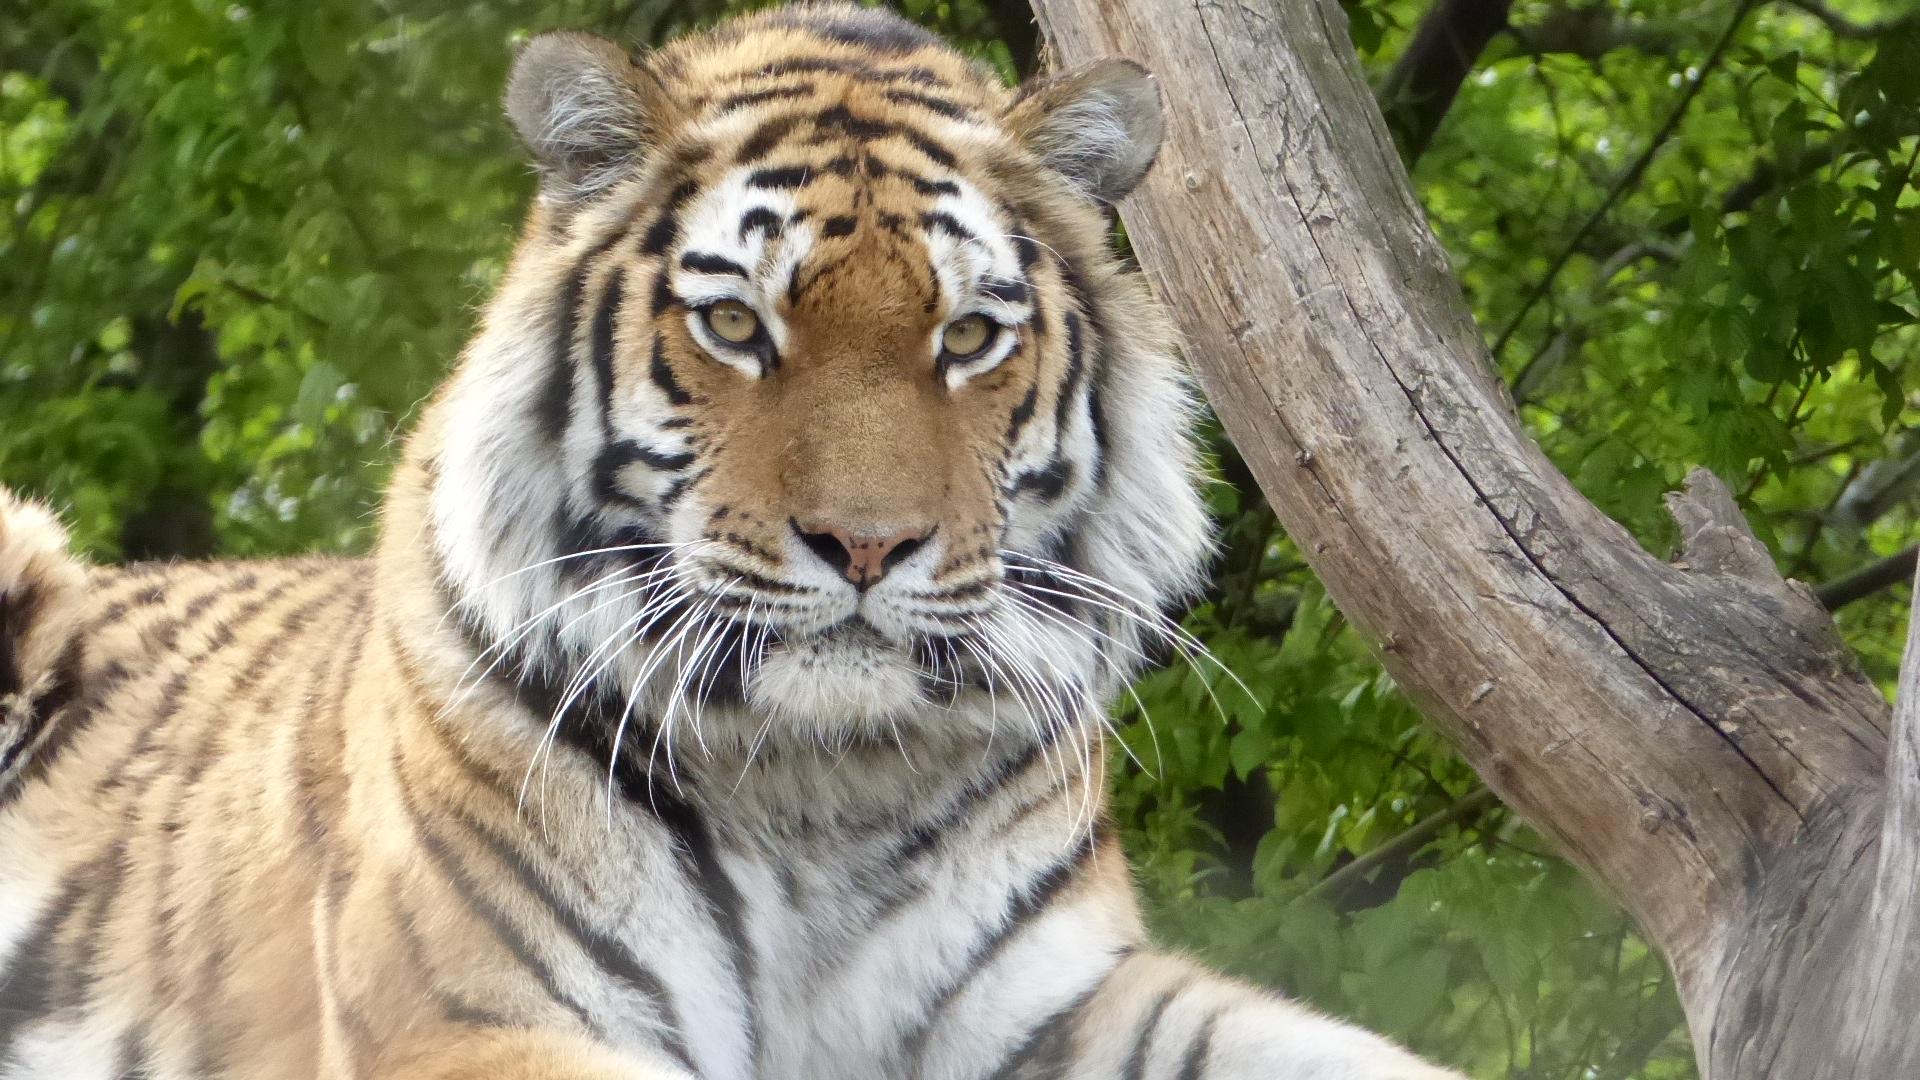 Tiger - Tiergarten Schönbrunn